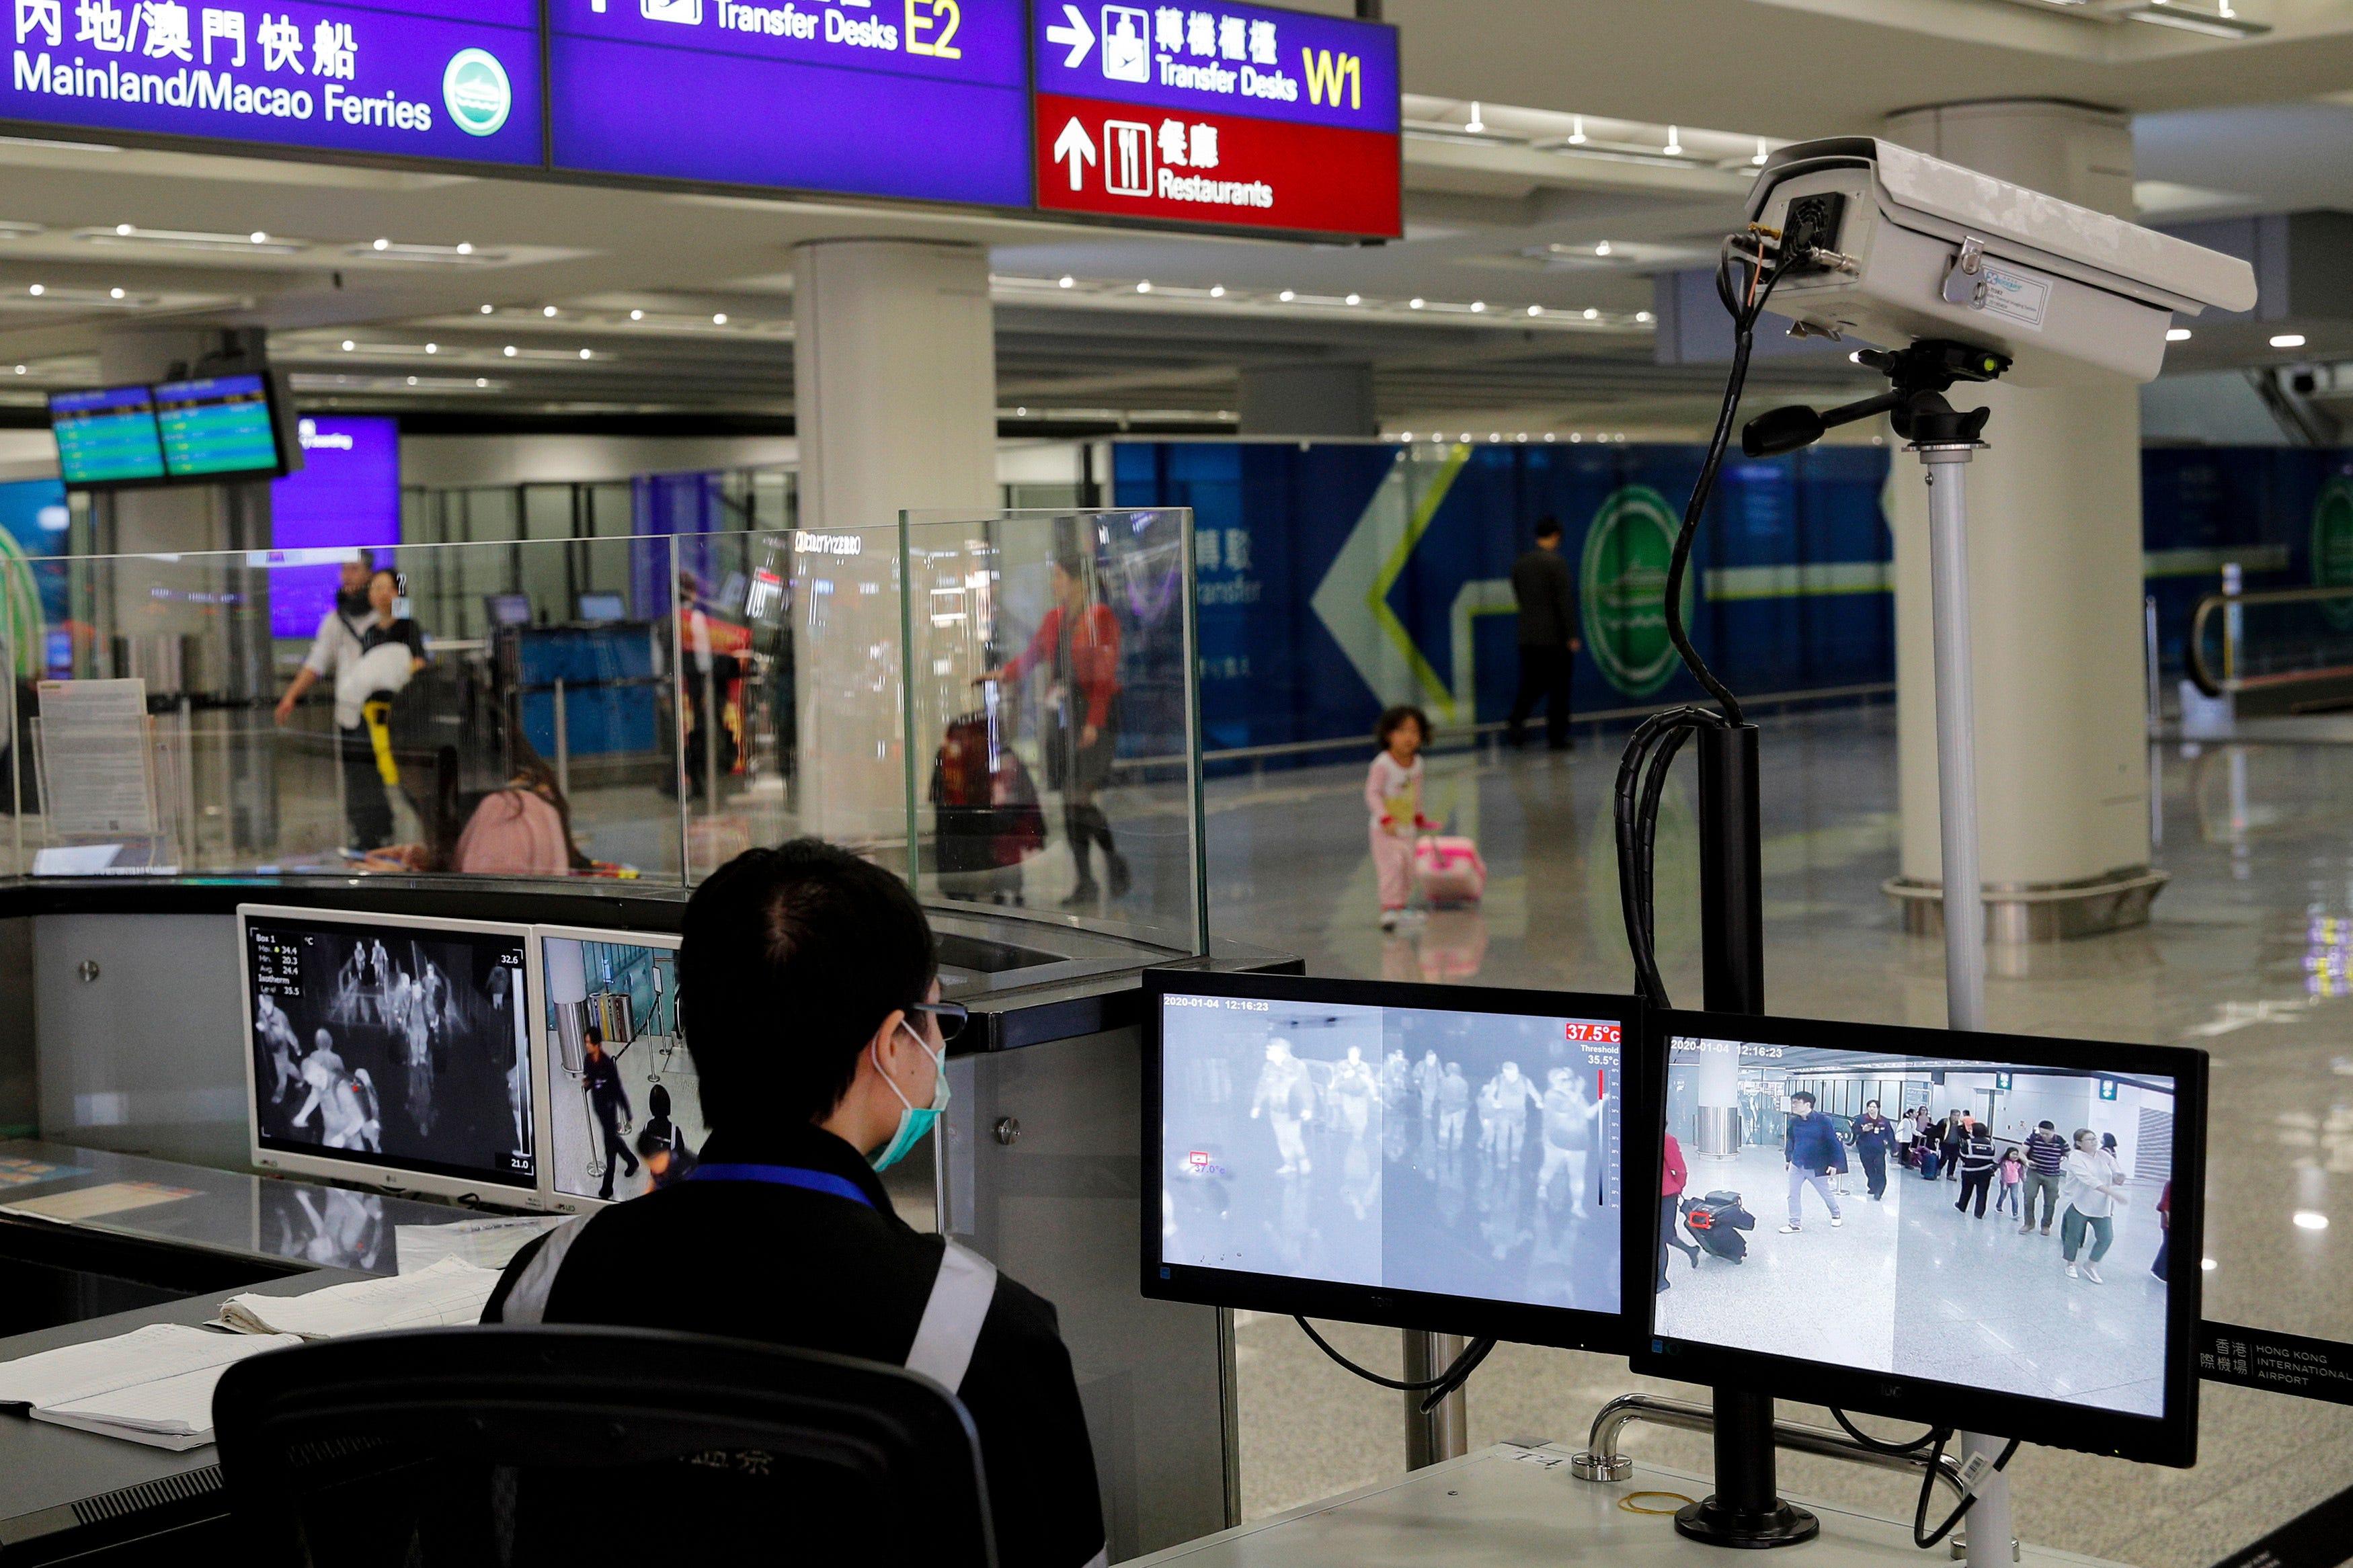 A health surveillance officer monitors passengers arriving at the Hong Kong International airport.